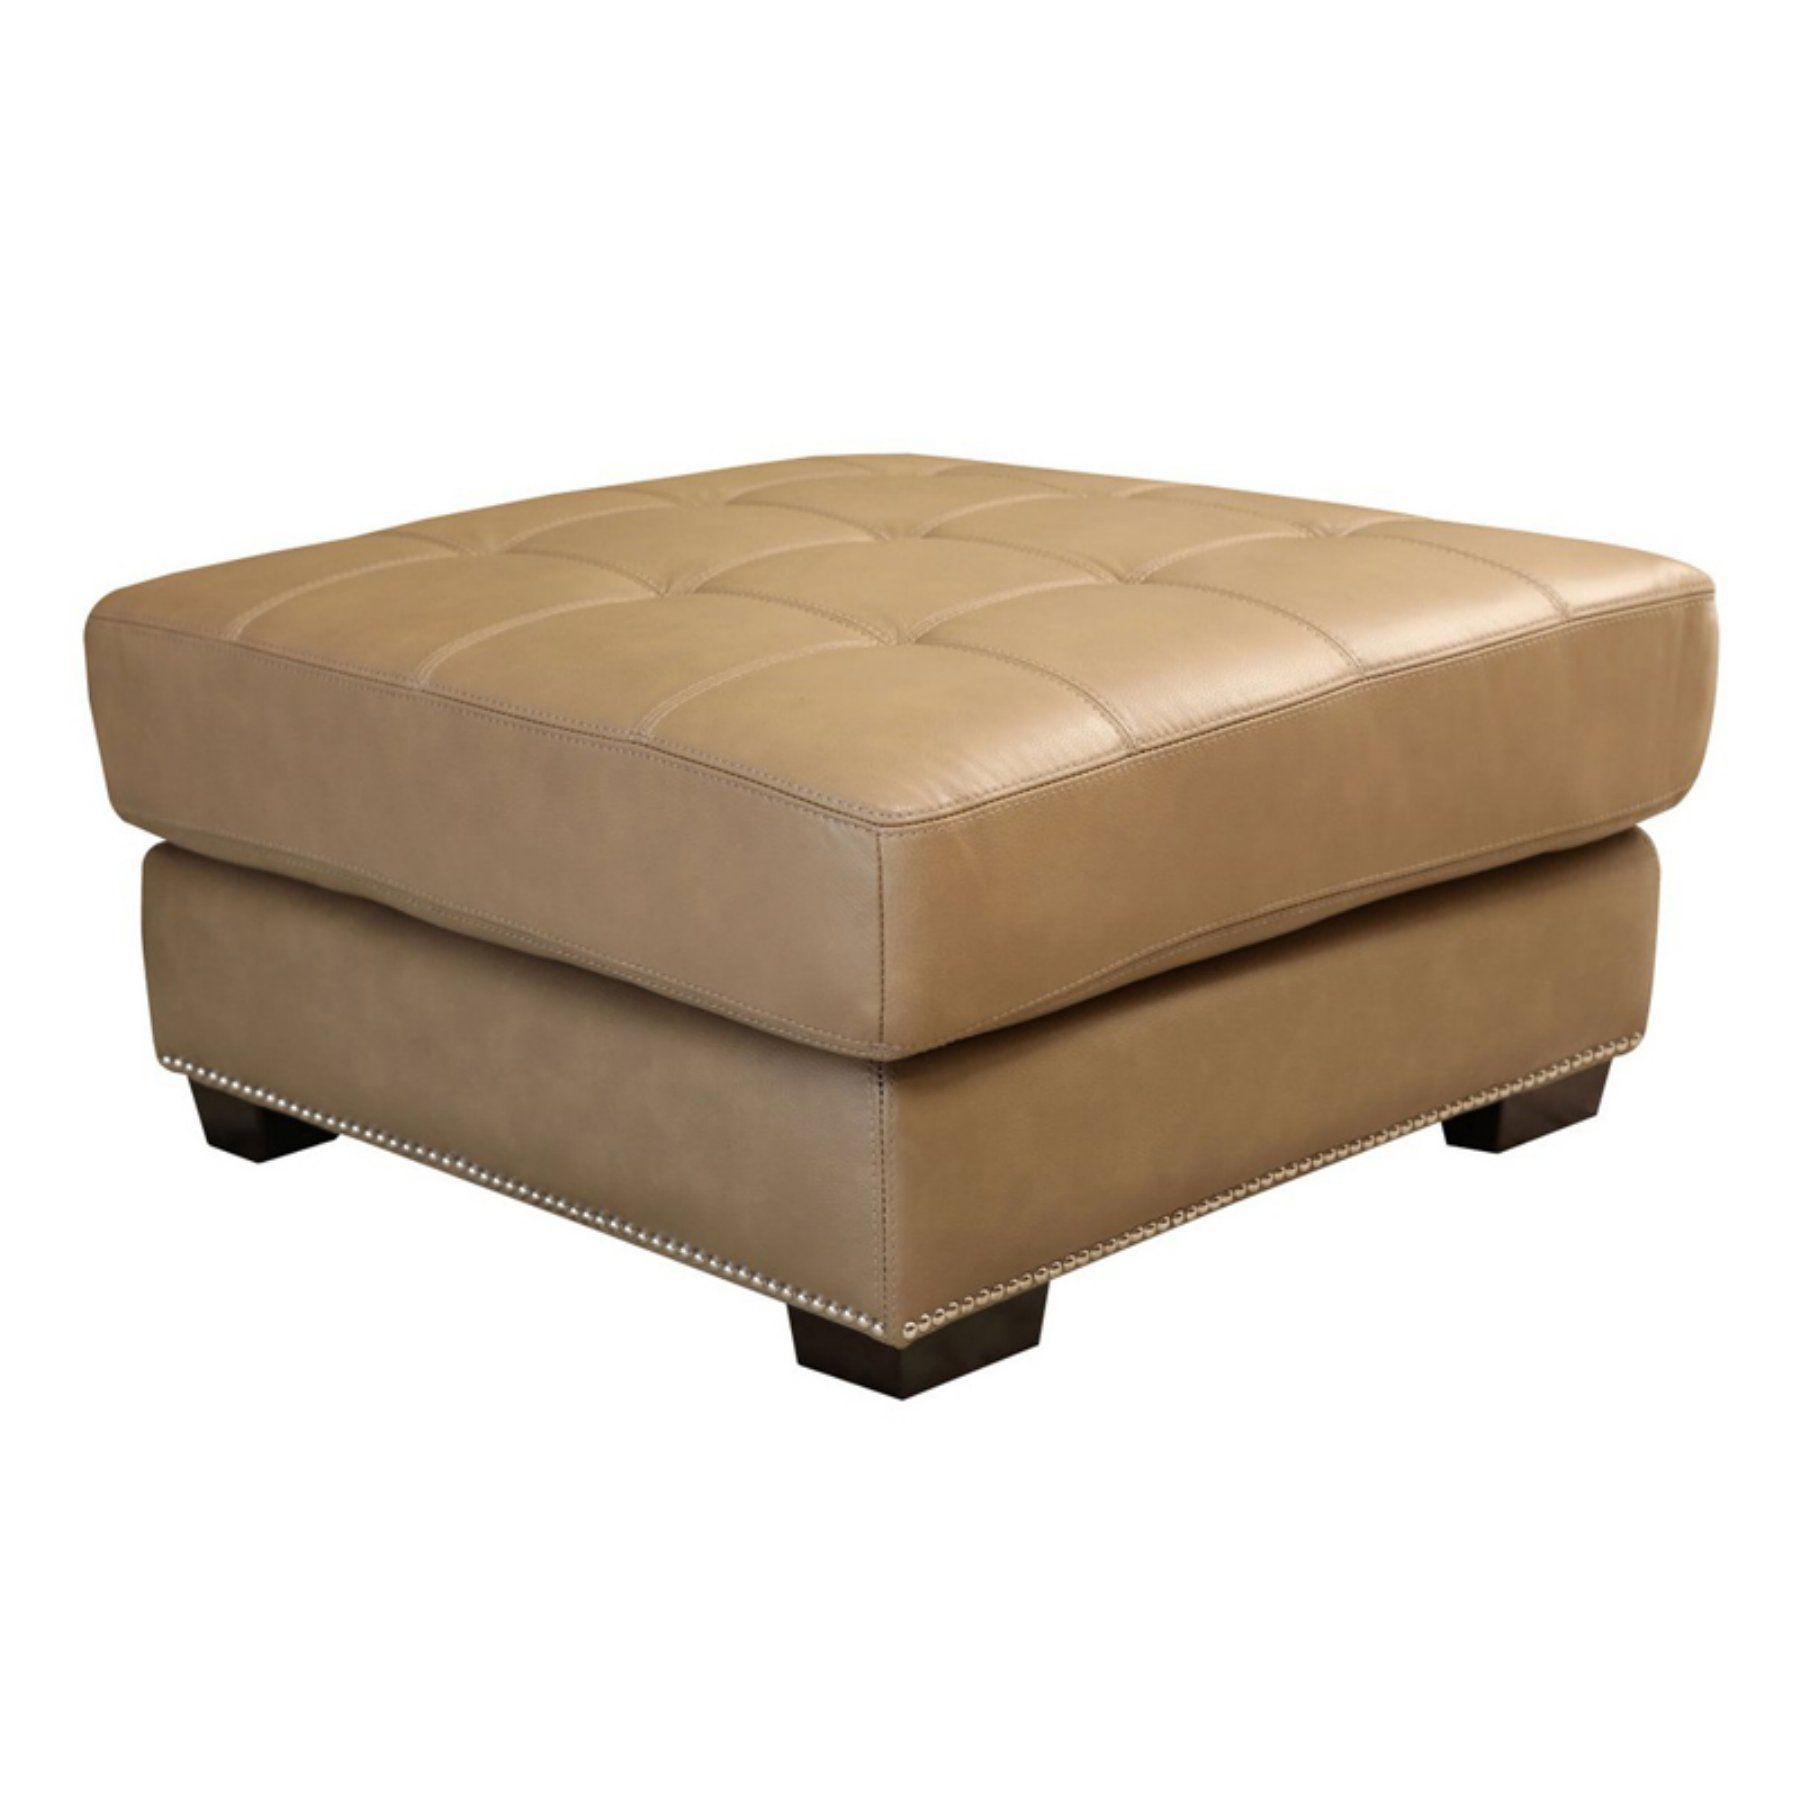 Pleasing Abbyson Margot Top Grain Leather Tufted Ottoman Beige Sk Theyellowbook Wood Chair Design Ideas Theyellowbookinfo